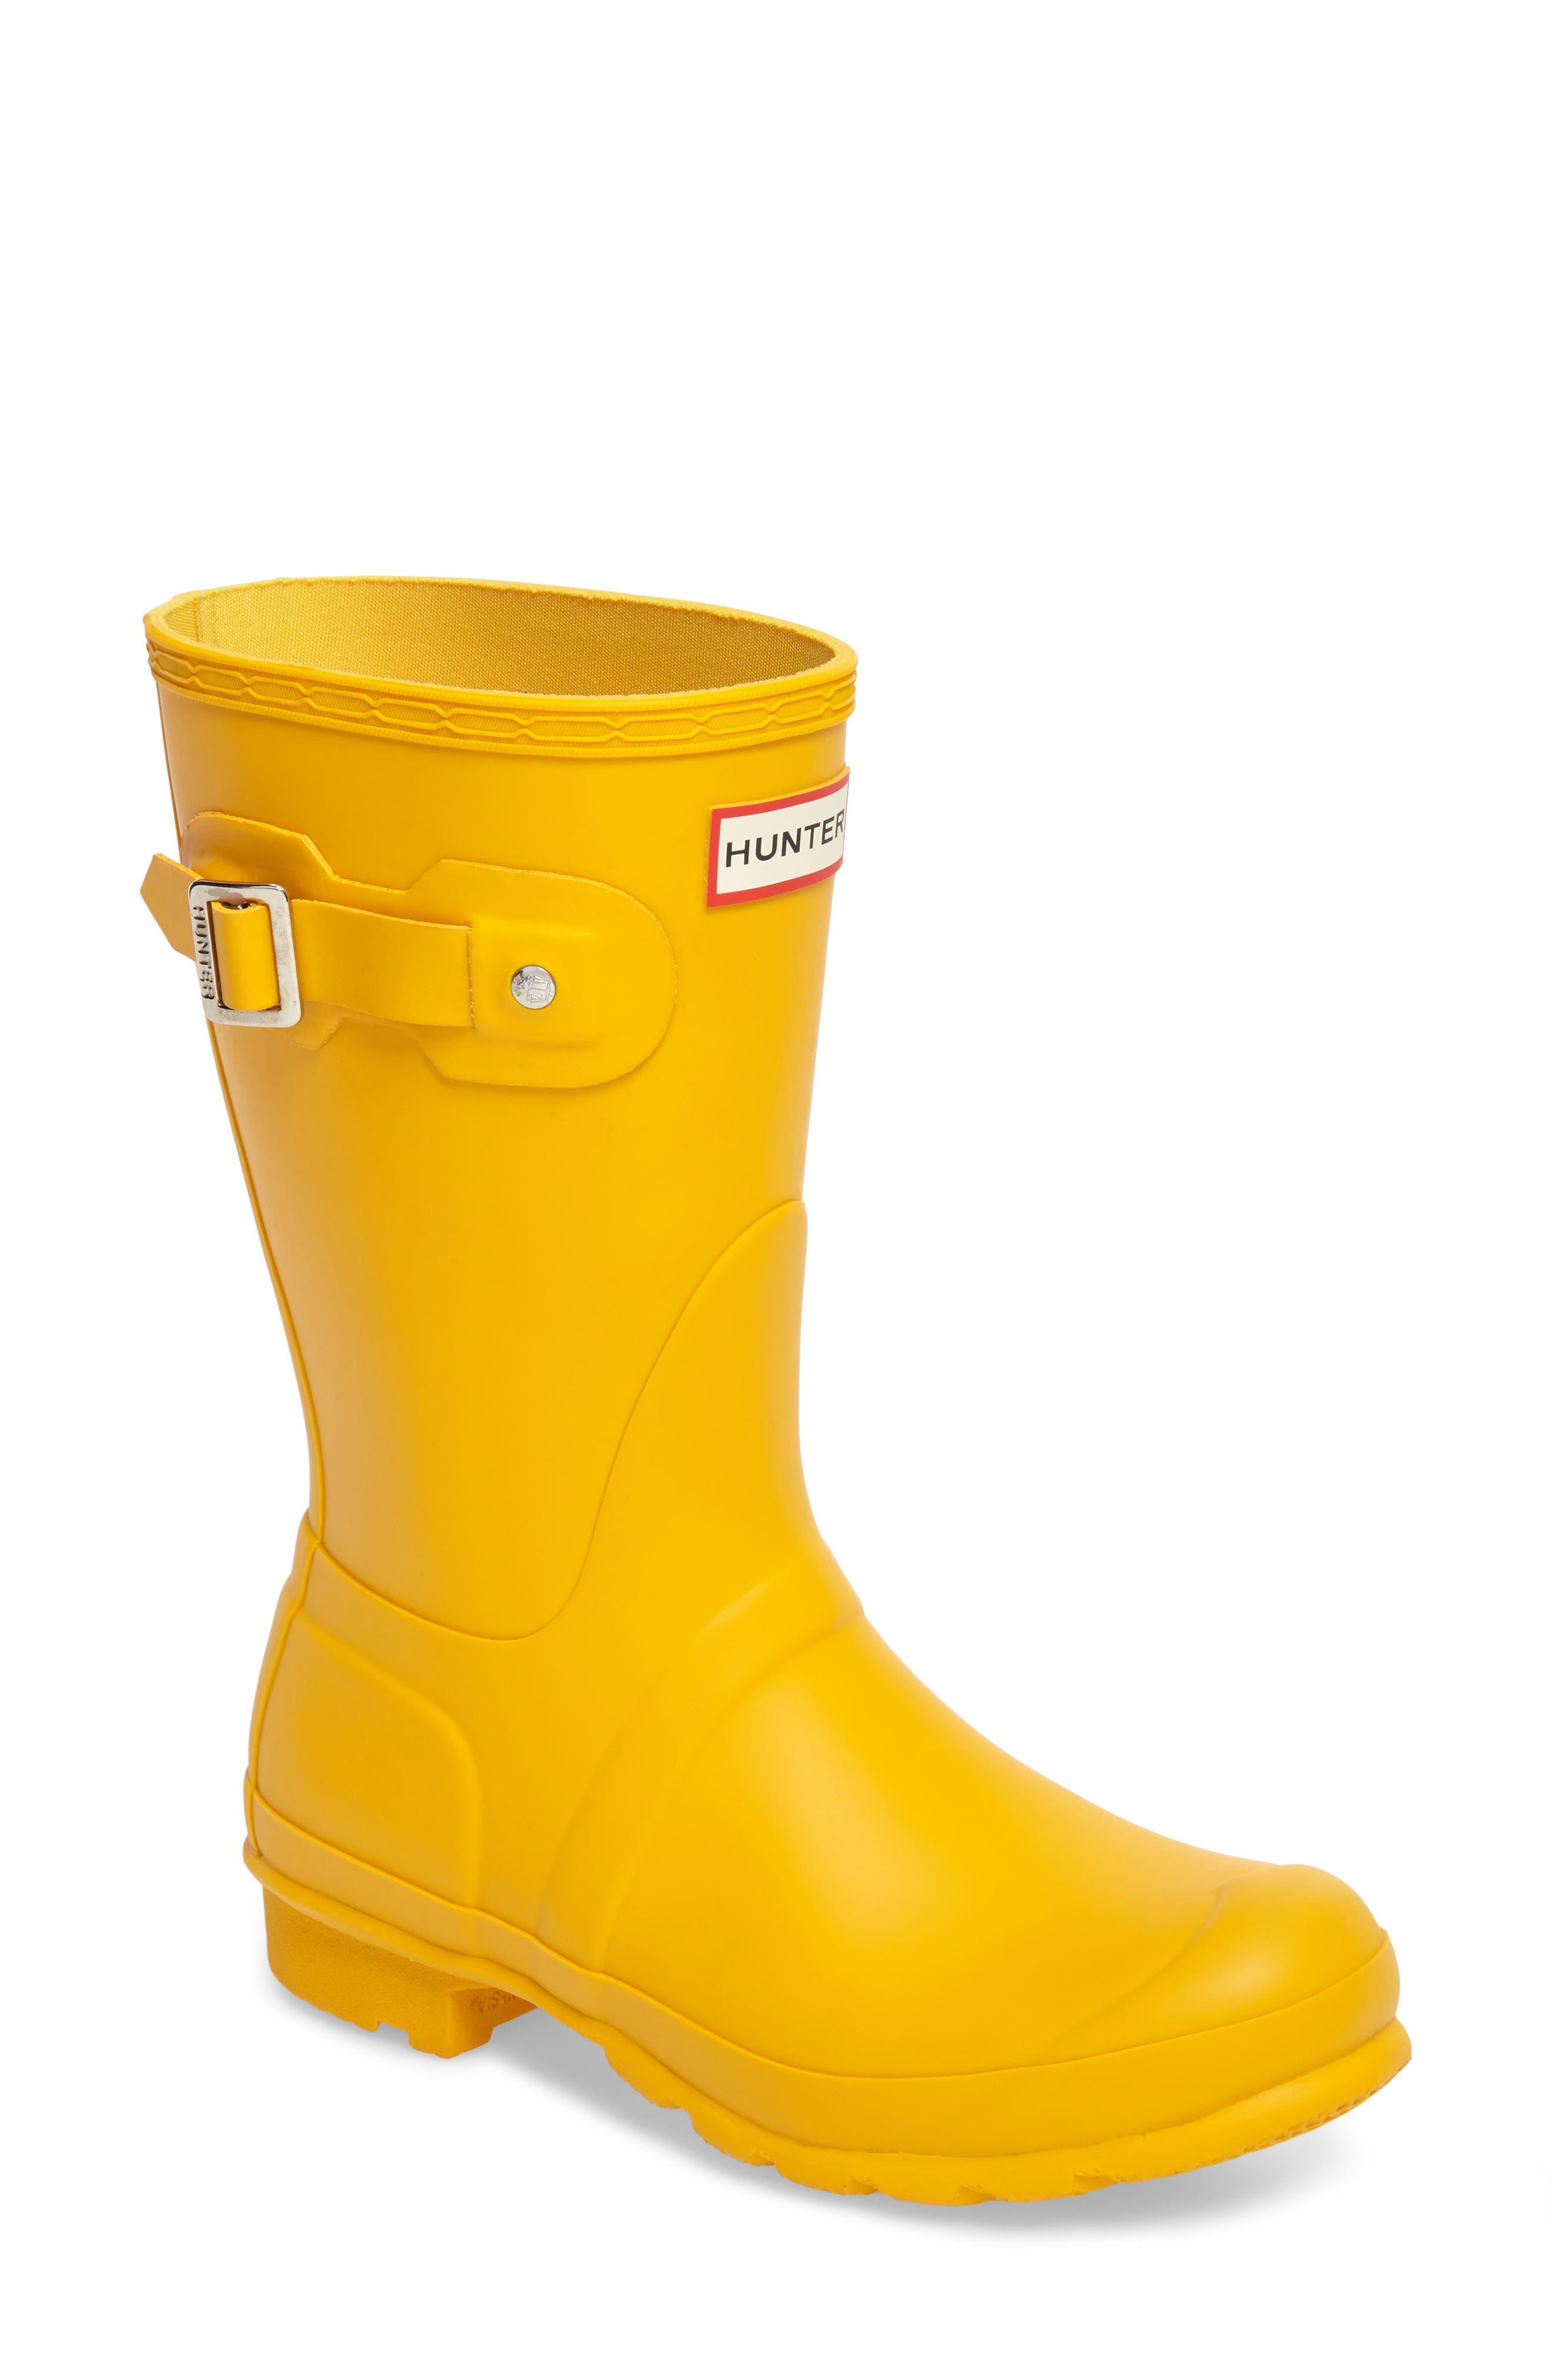 HUNTER Original Short Waterproof Rain Boot, Main, color, YELLOW/ YELLOW